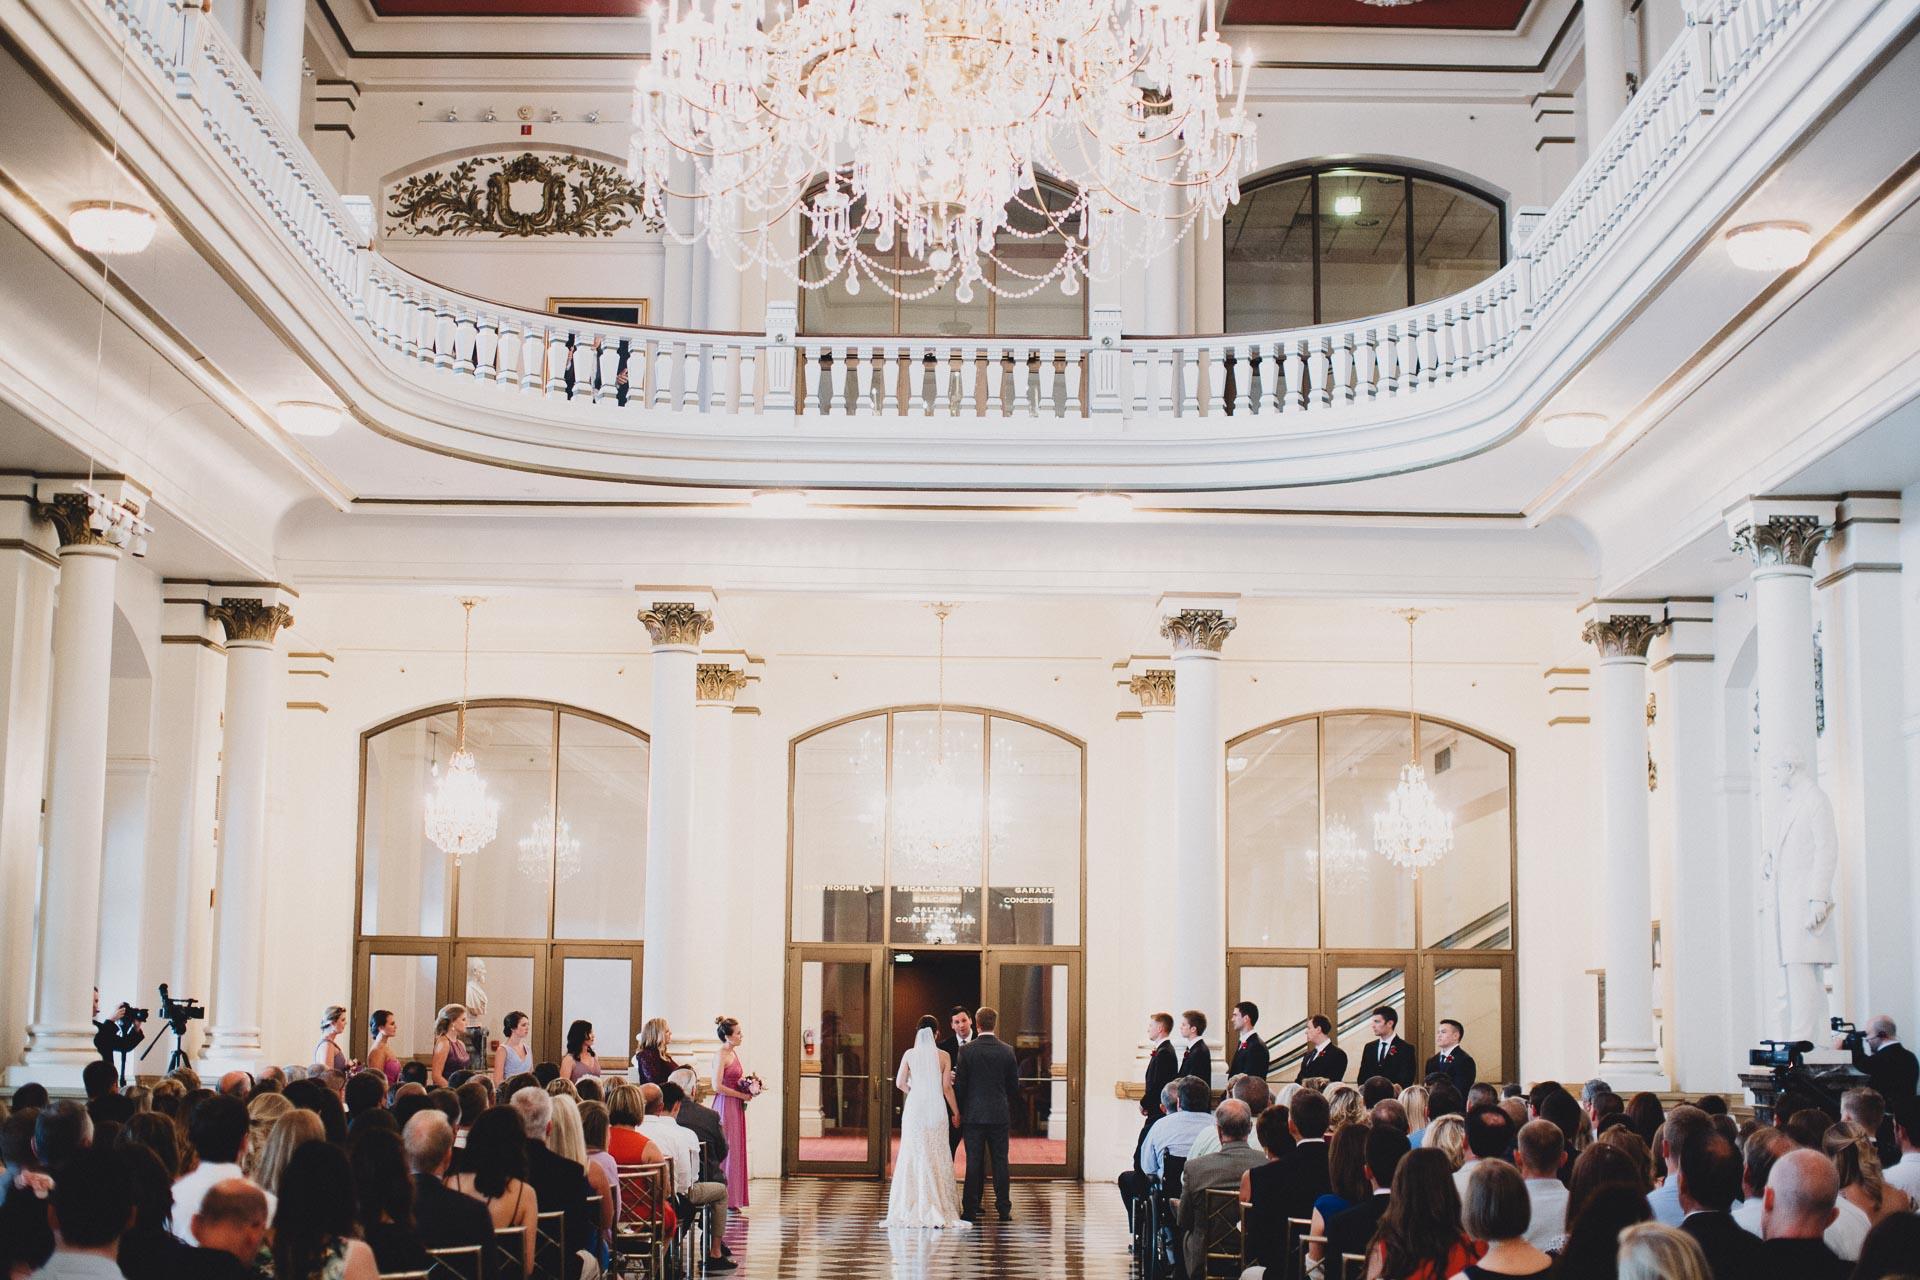 Julia-Michael-Cincinnati-Music-Hall-Wedding-103@2x.jpg